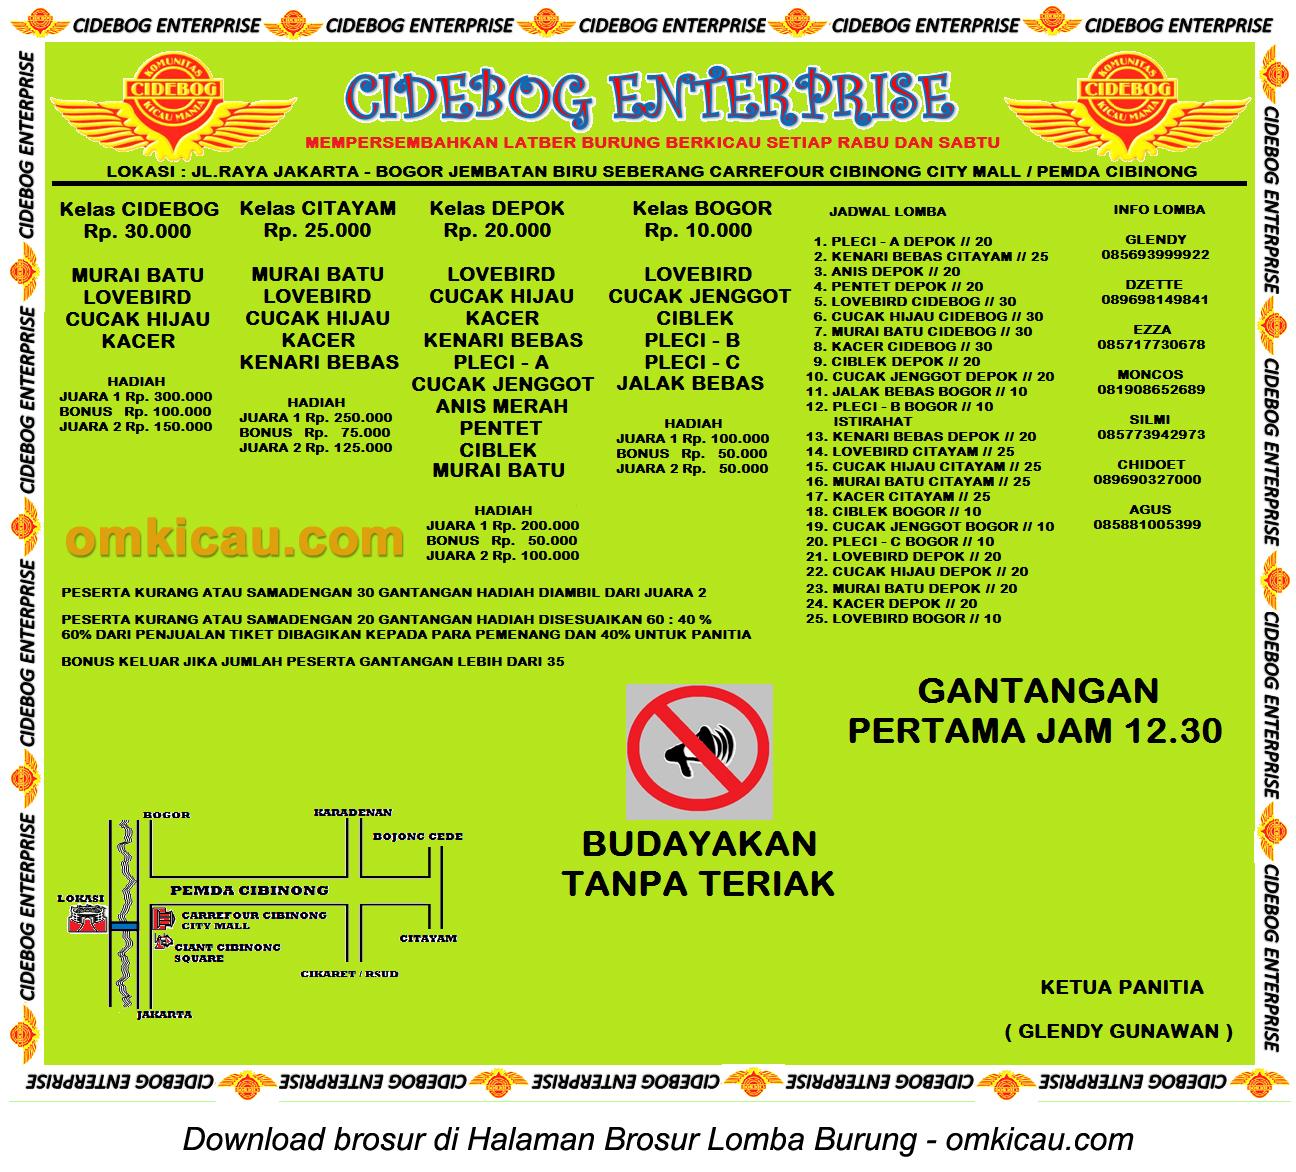 Latber Cibedog Enterprise Cibinong - setiap Rabu dan Sabtu